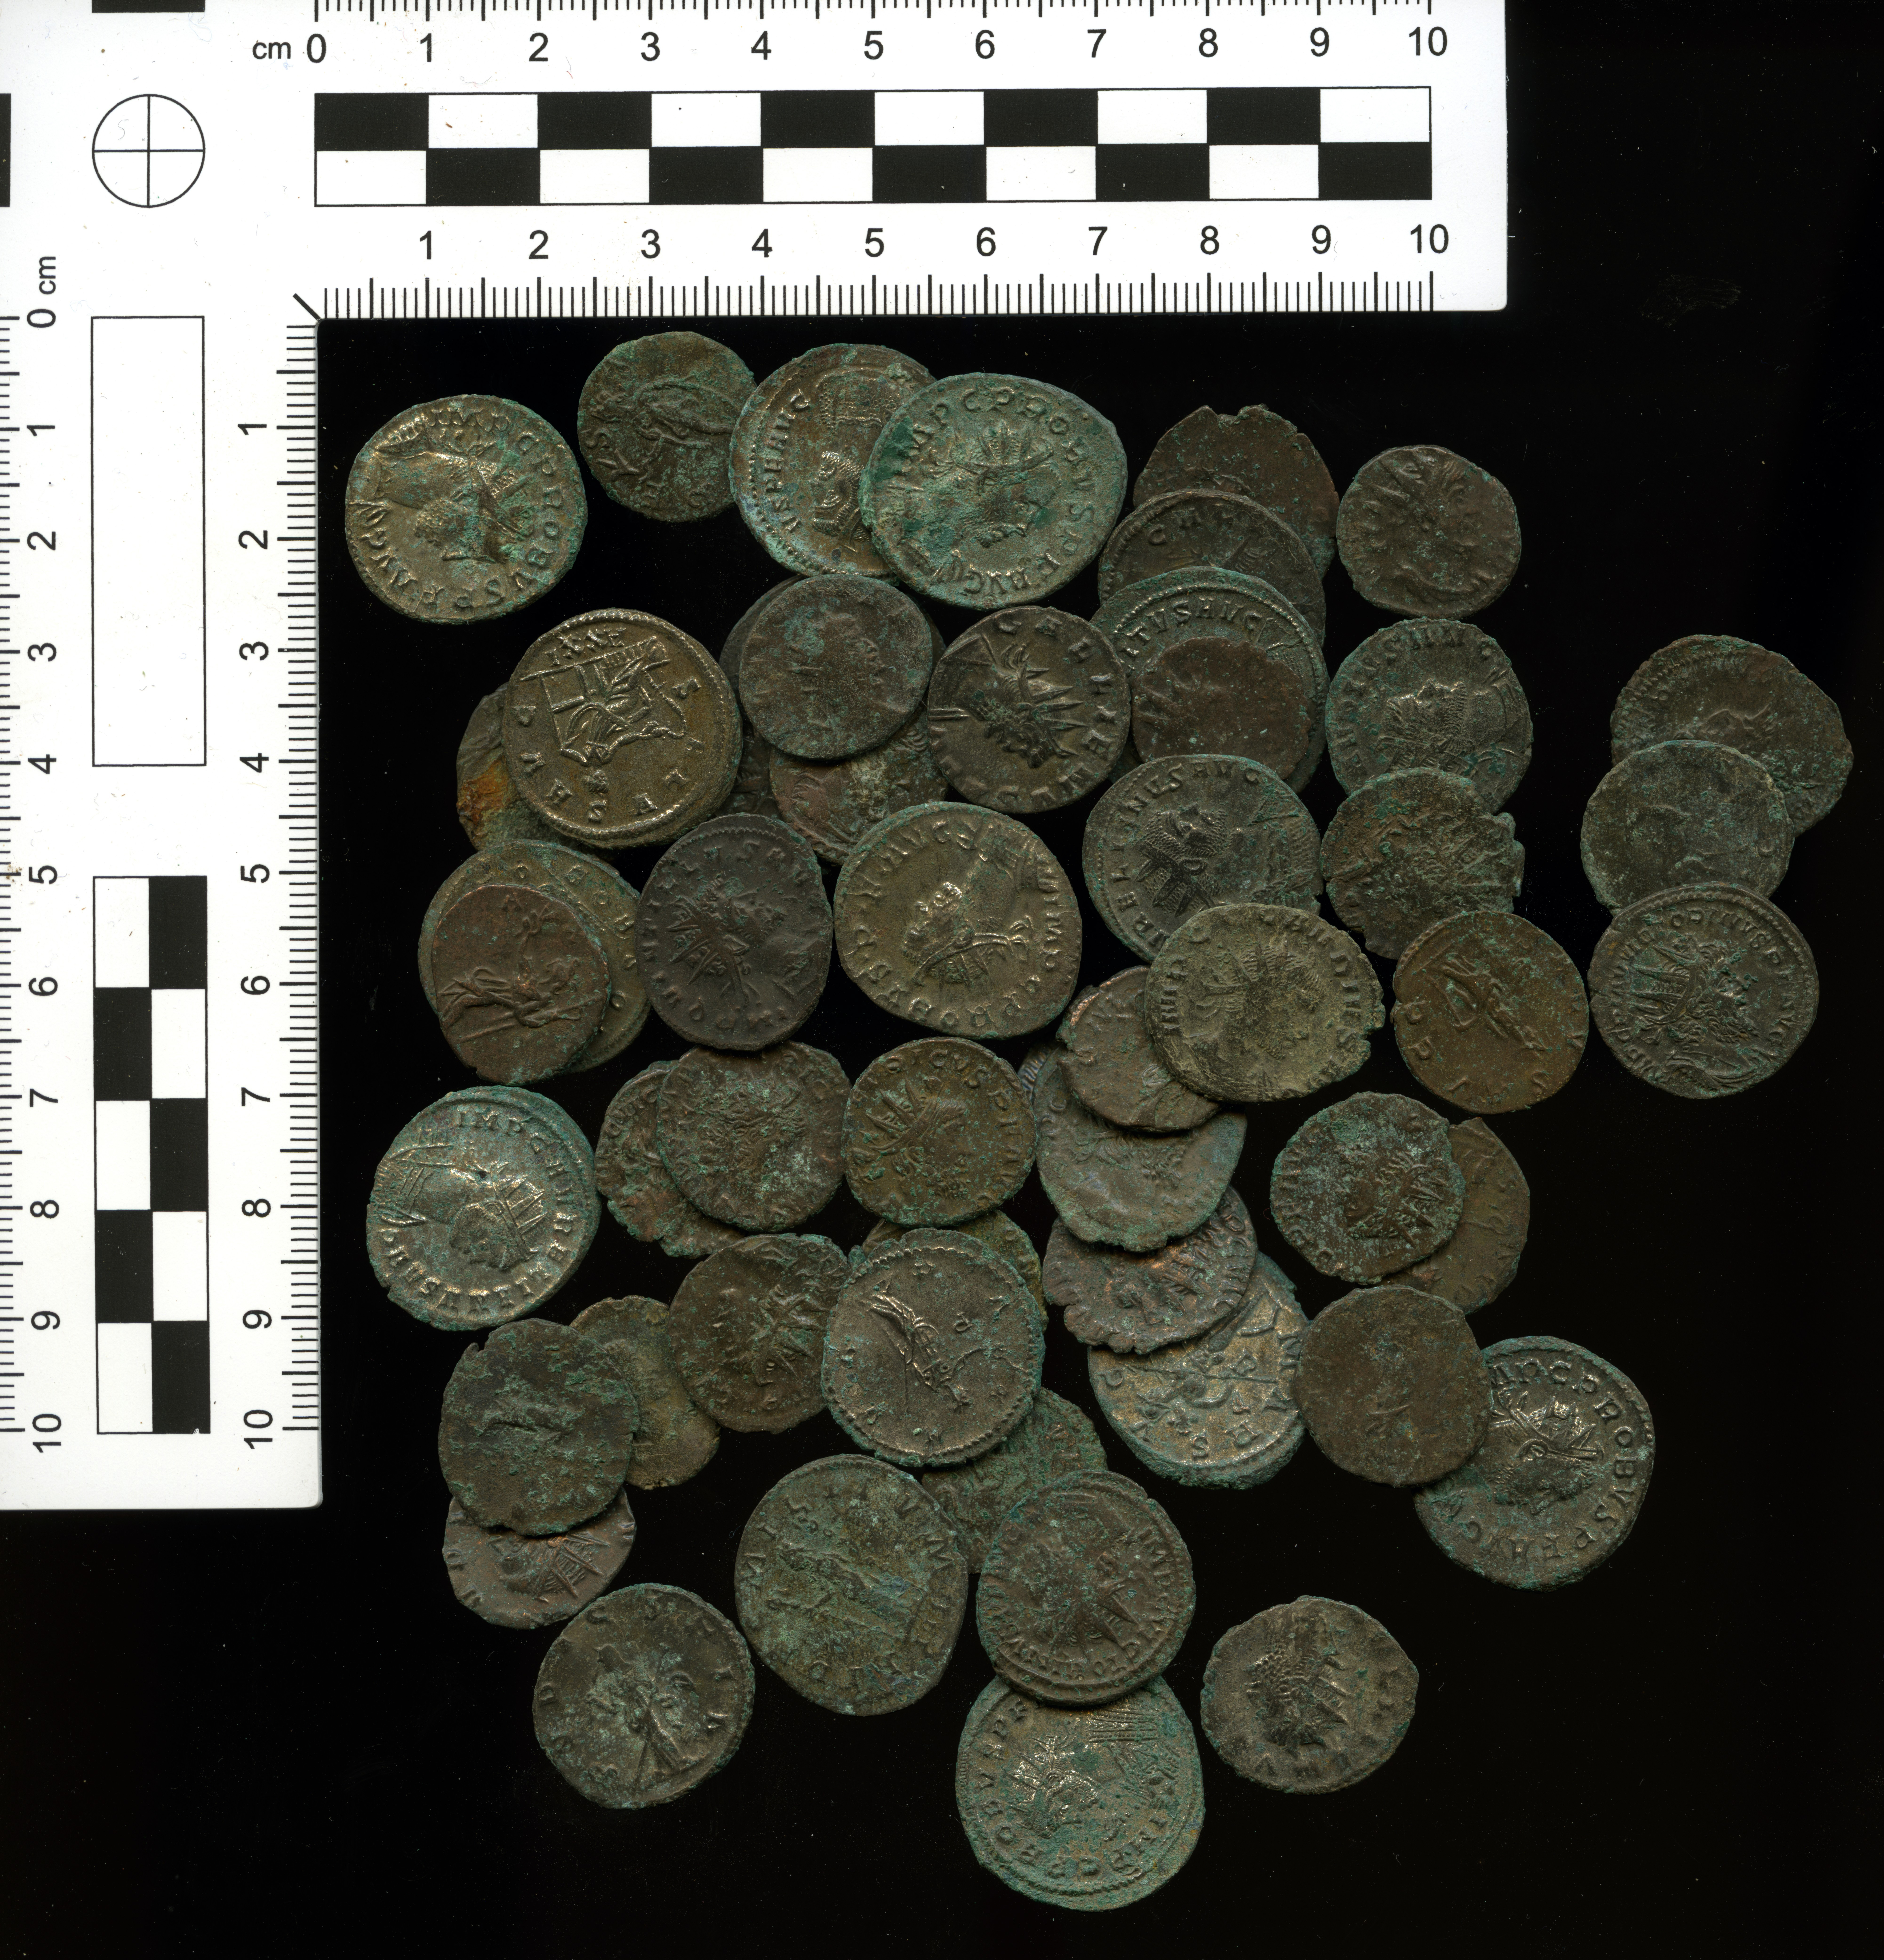 Piddletrenthide hoard coin sample (British Museum)